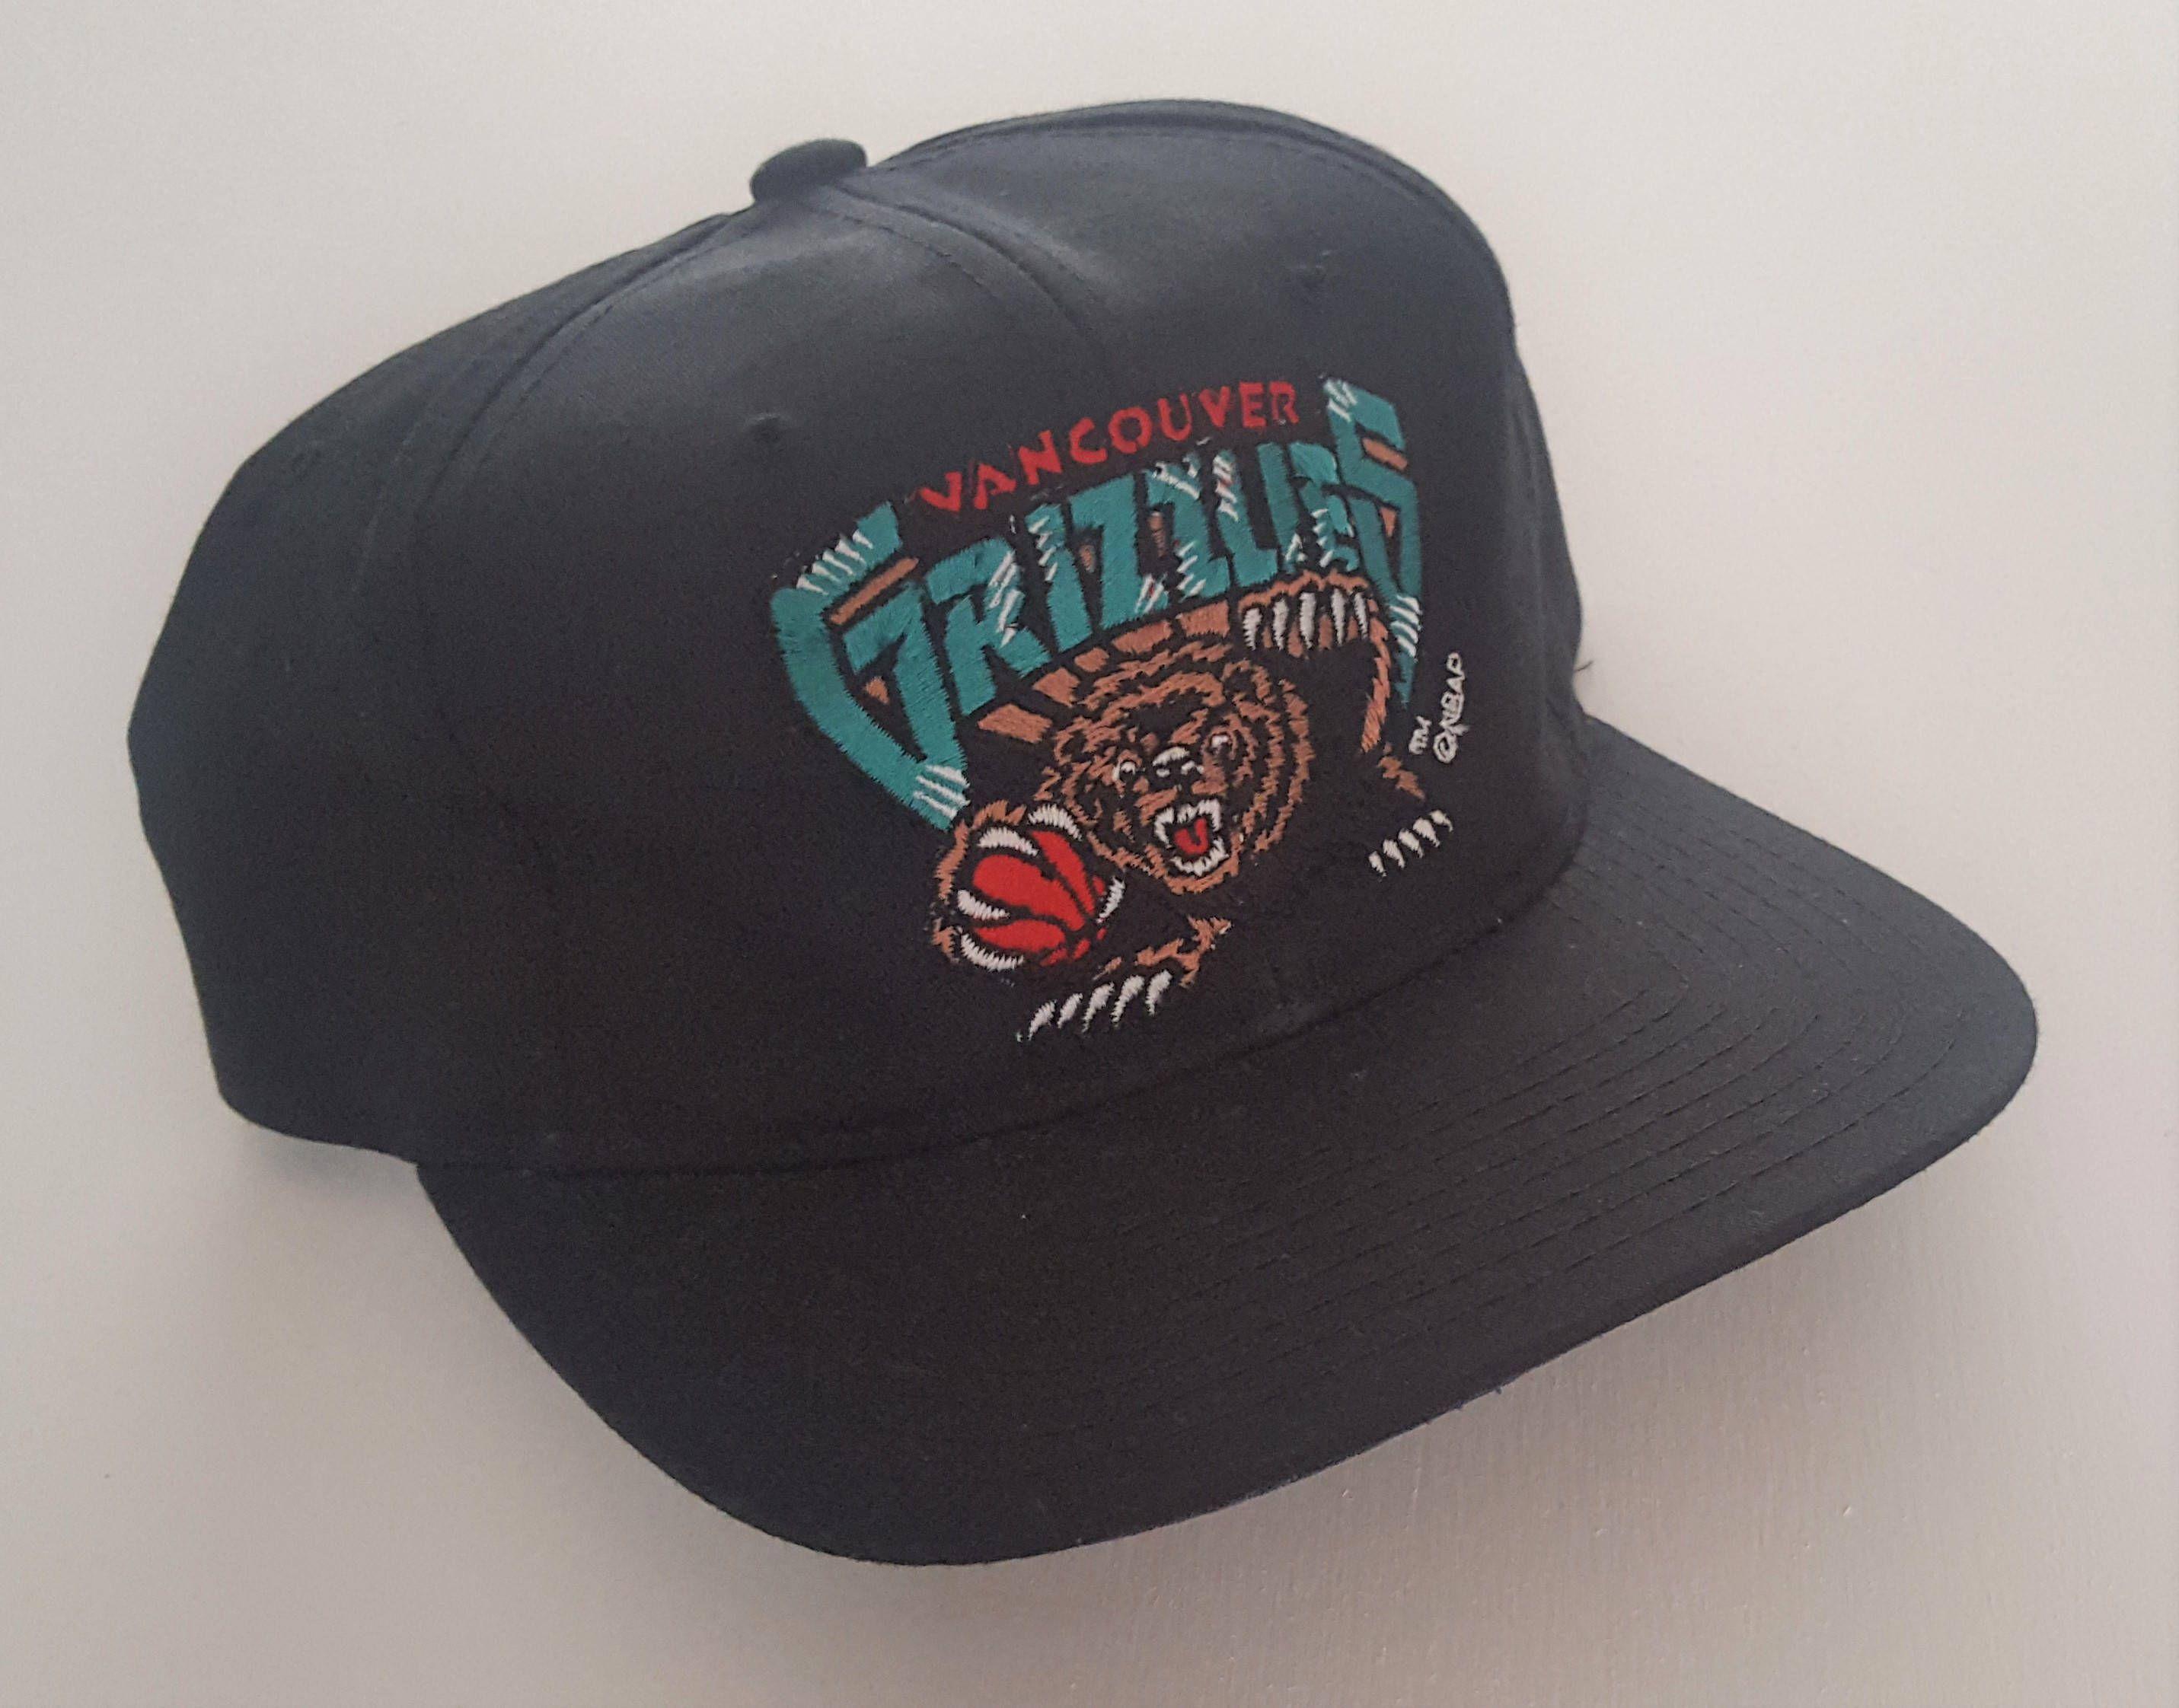 new concept 50bd8 574f2 Vintage Vancouver Grizzlies Starter Snapback Hat NBA VTG by  StreetwearAndVintage on Etsy